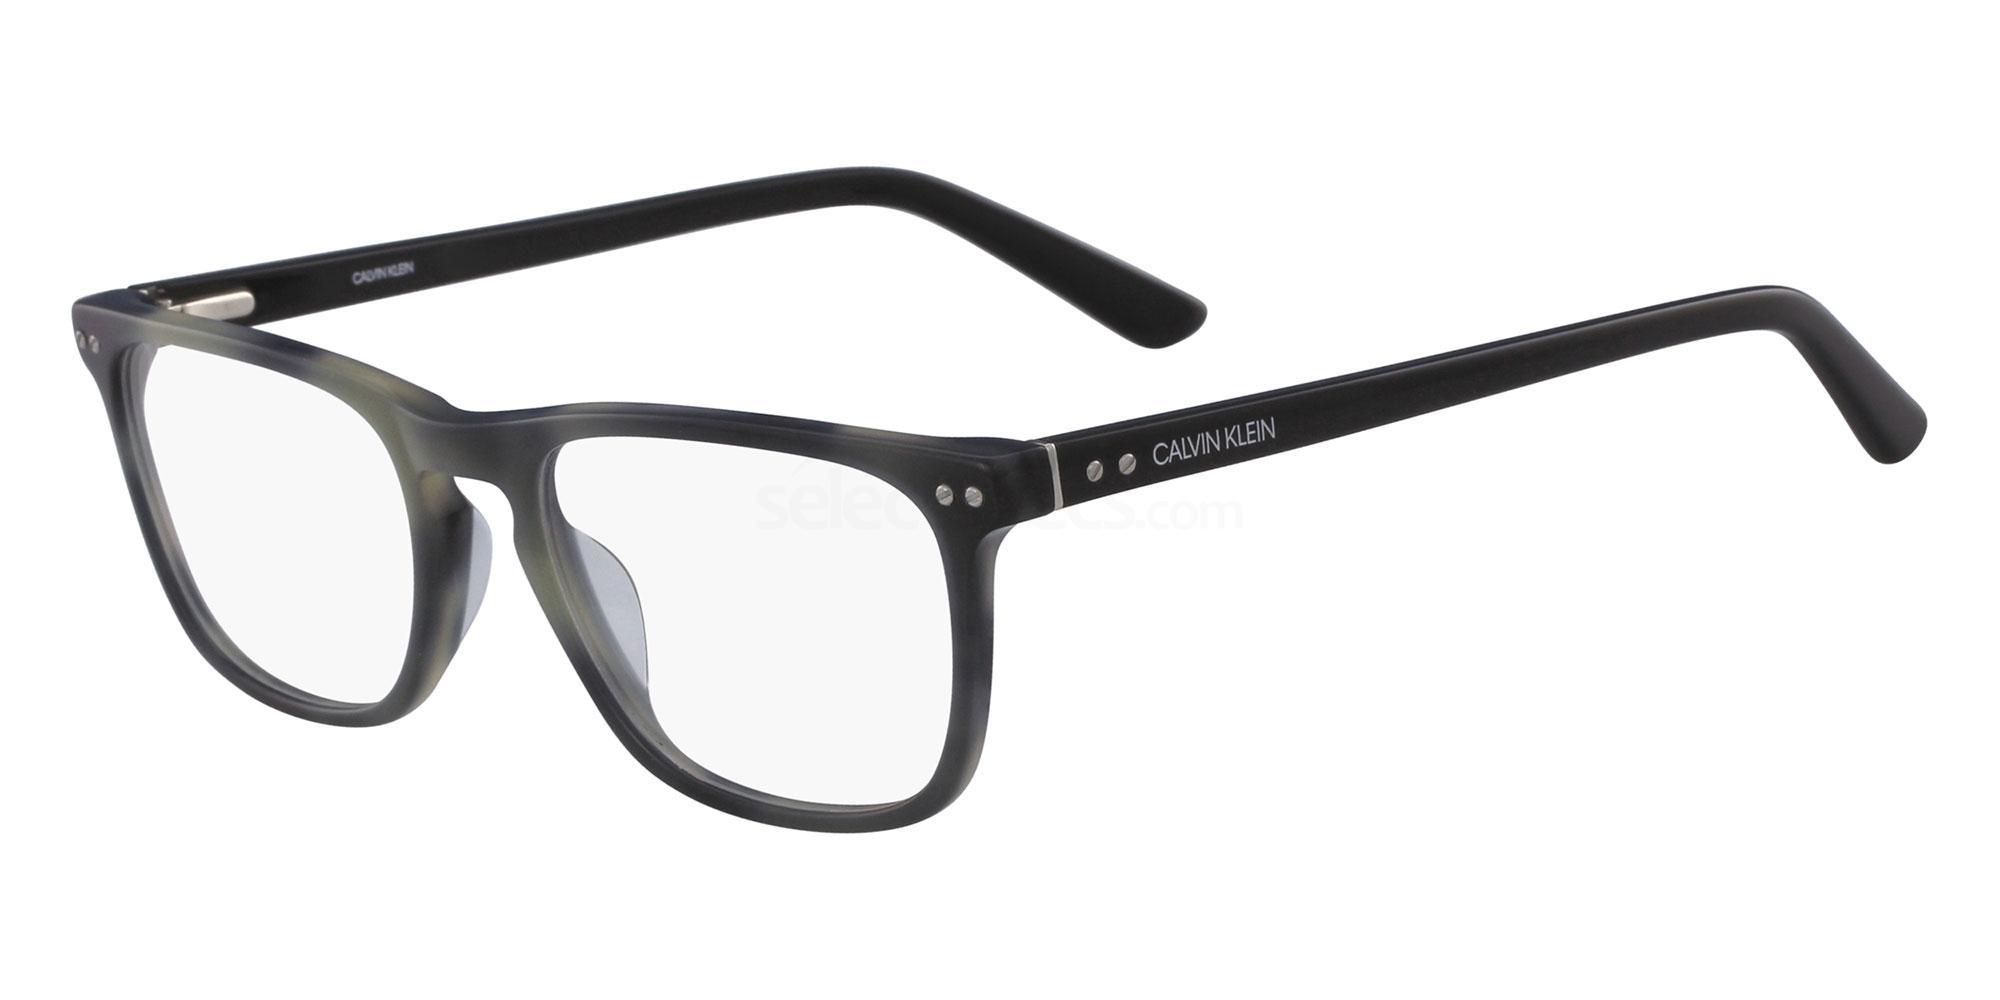 007 CK18513 Glasses, Calvin Klein